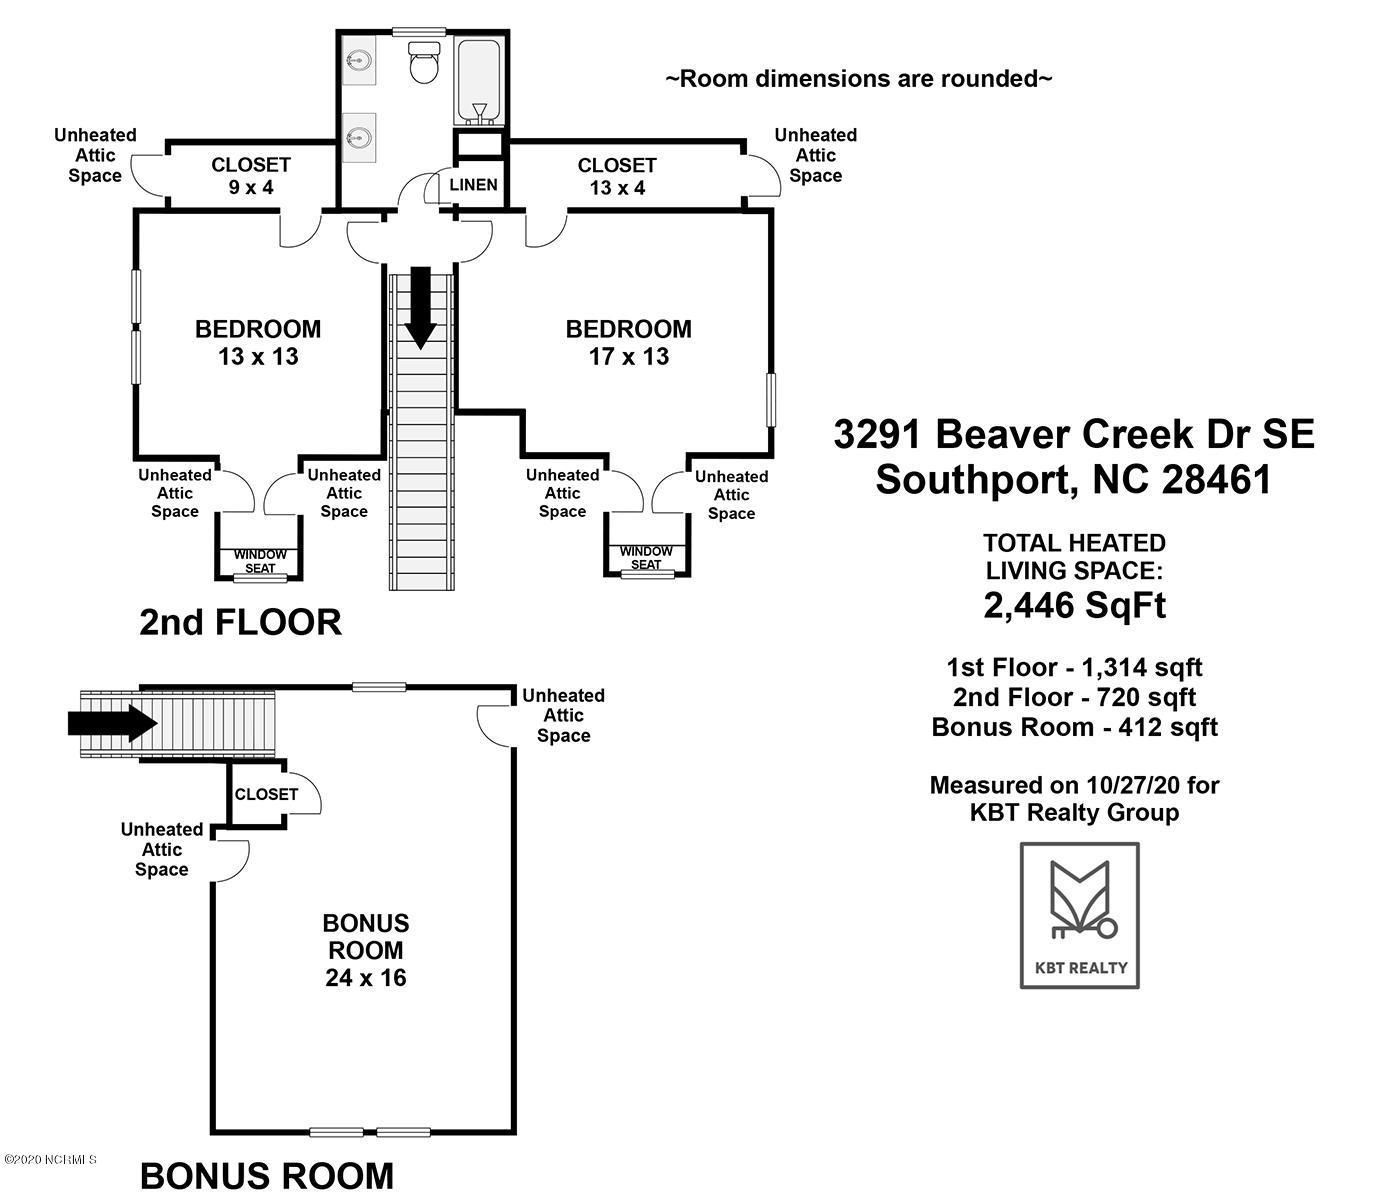 3291 Beaver Creek Drive Southport, NC 28461